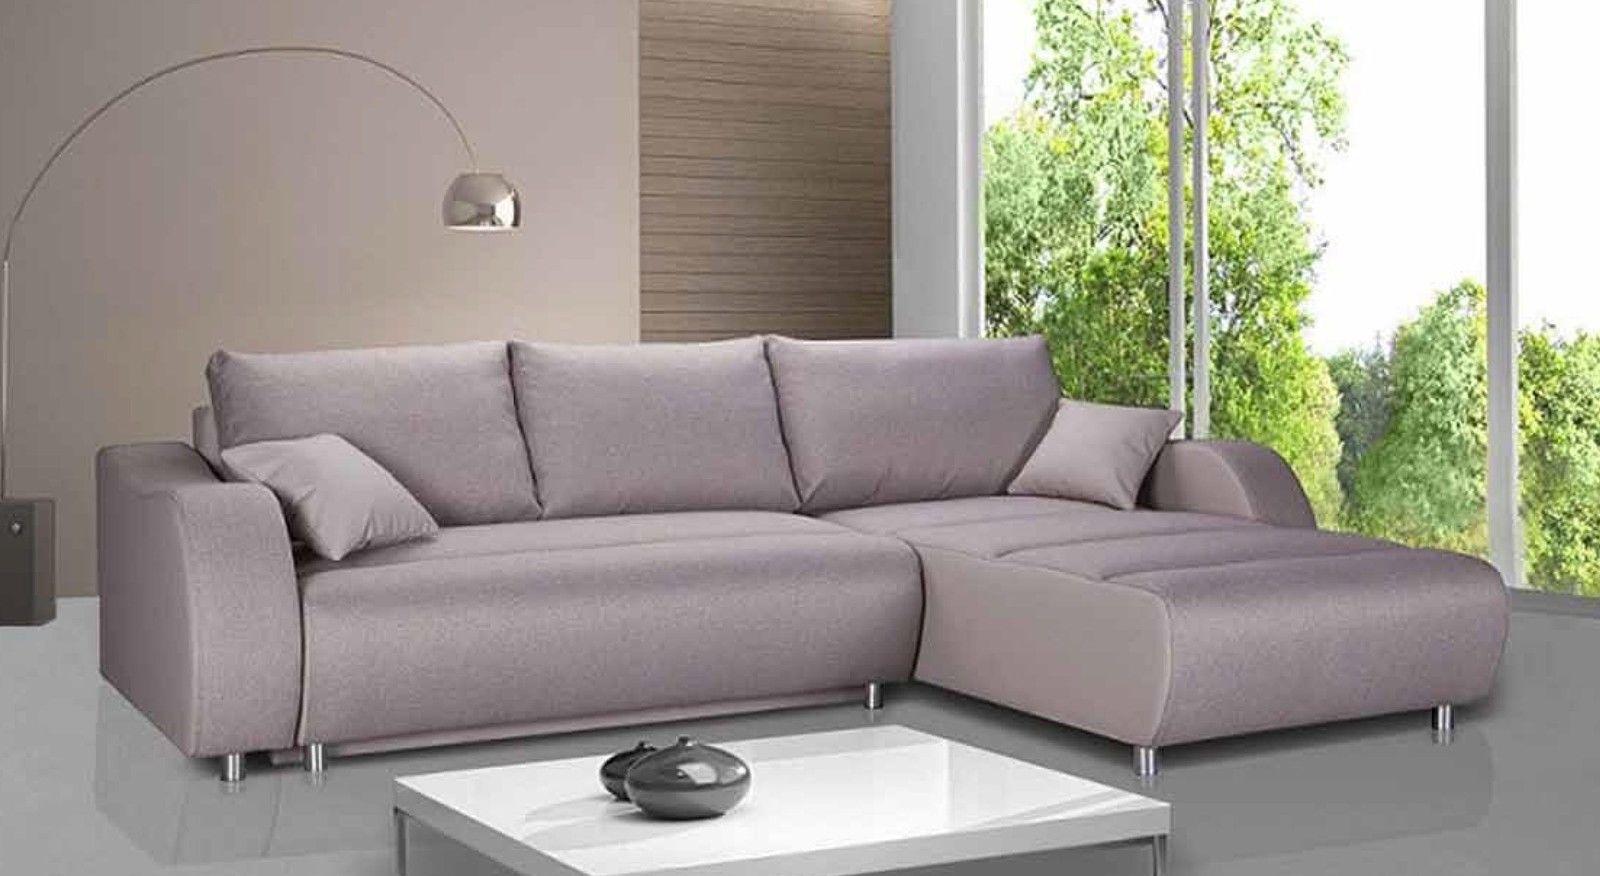 Spectacular Sofa Deals 83 In with Sofa Deals